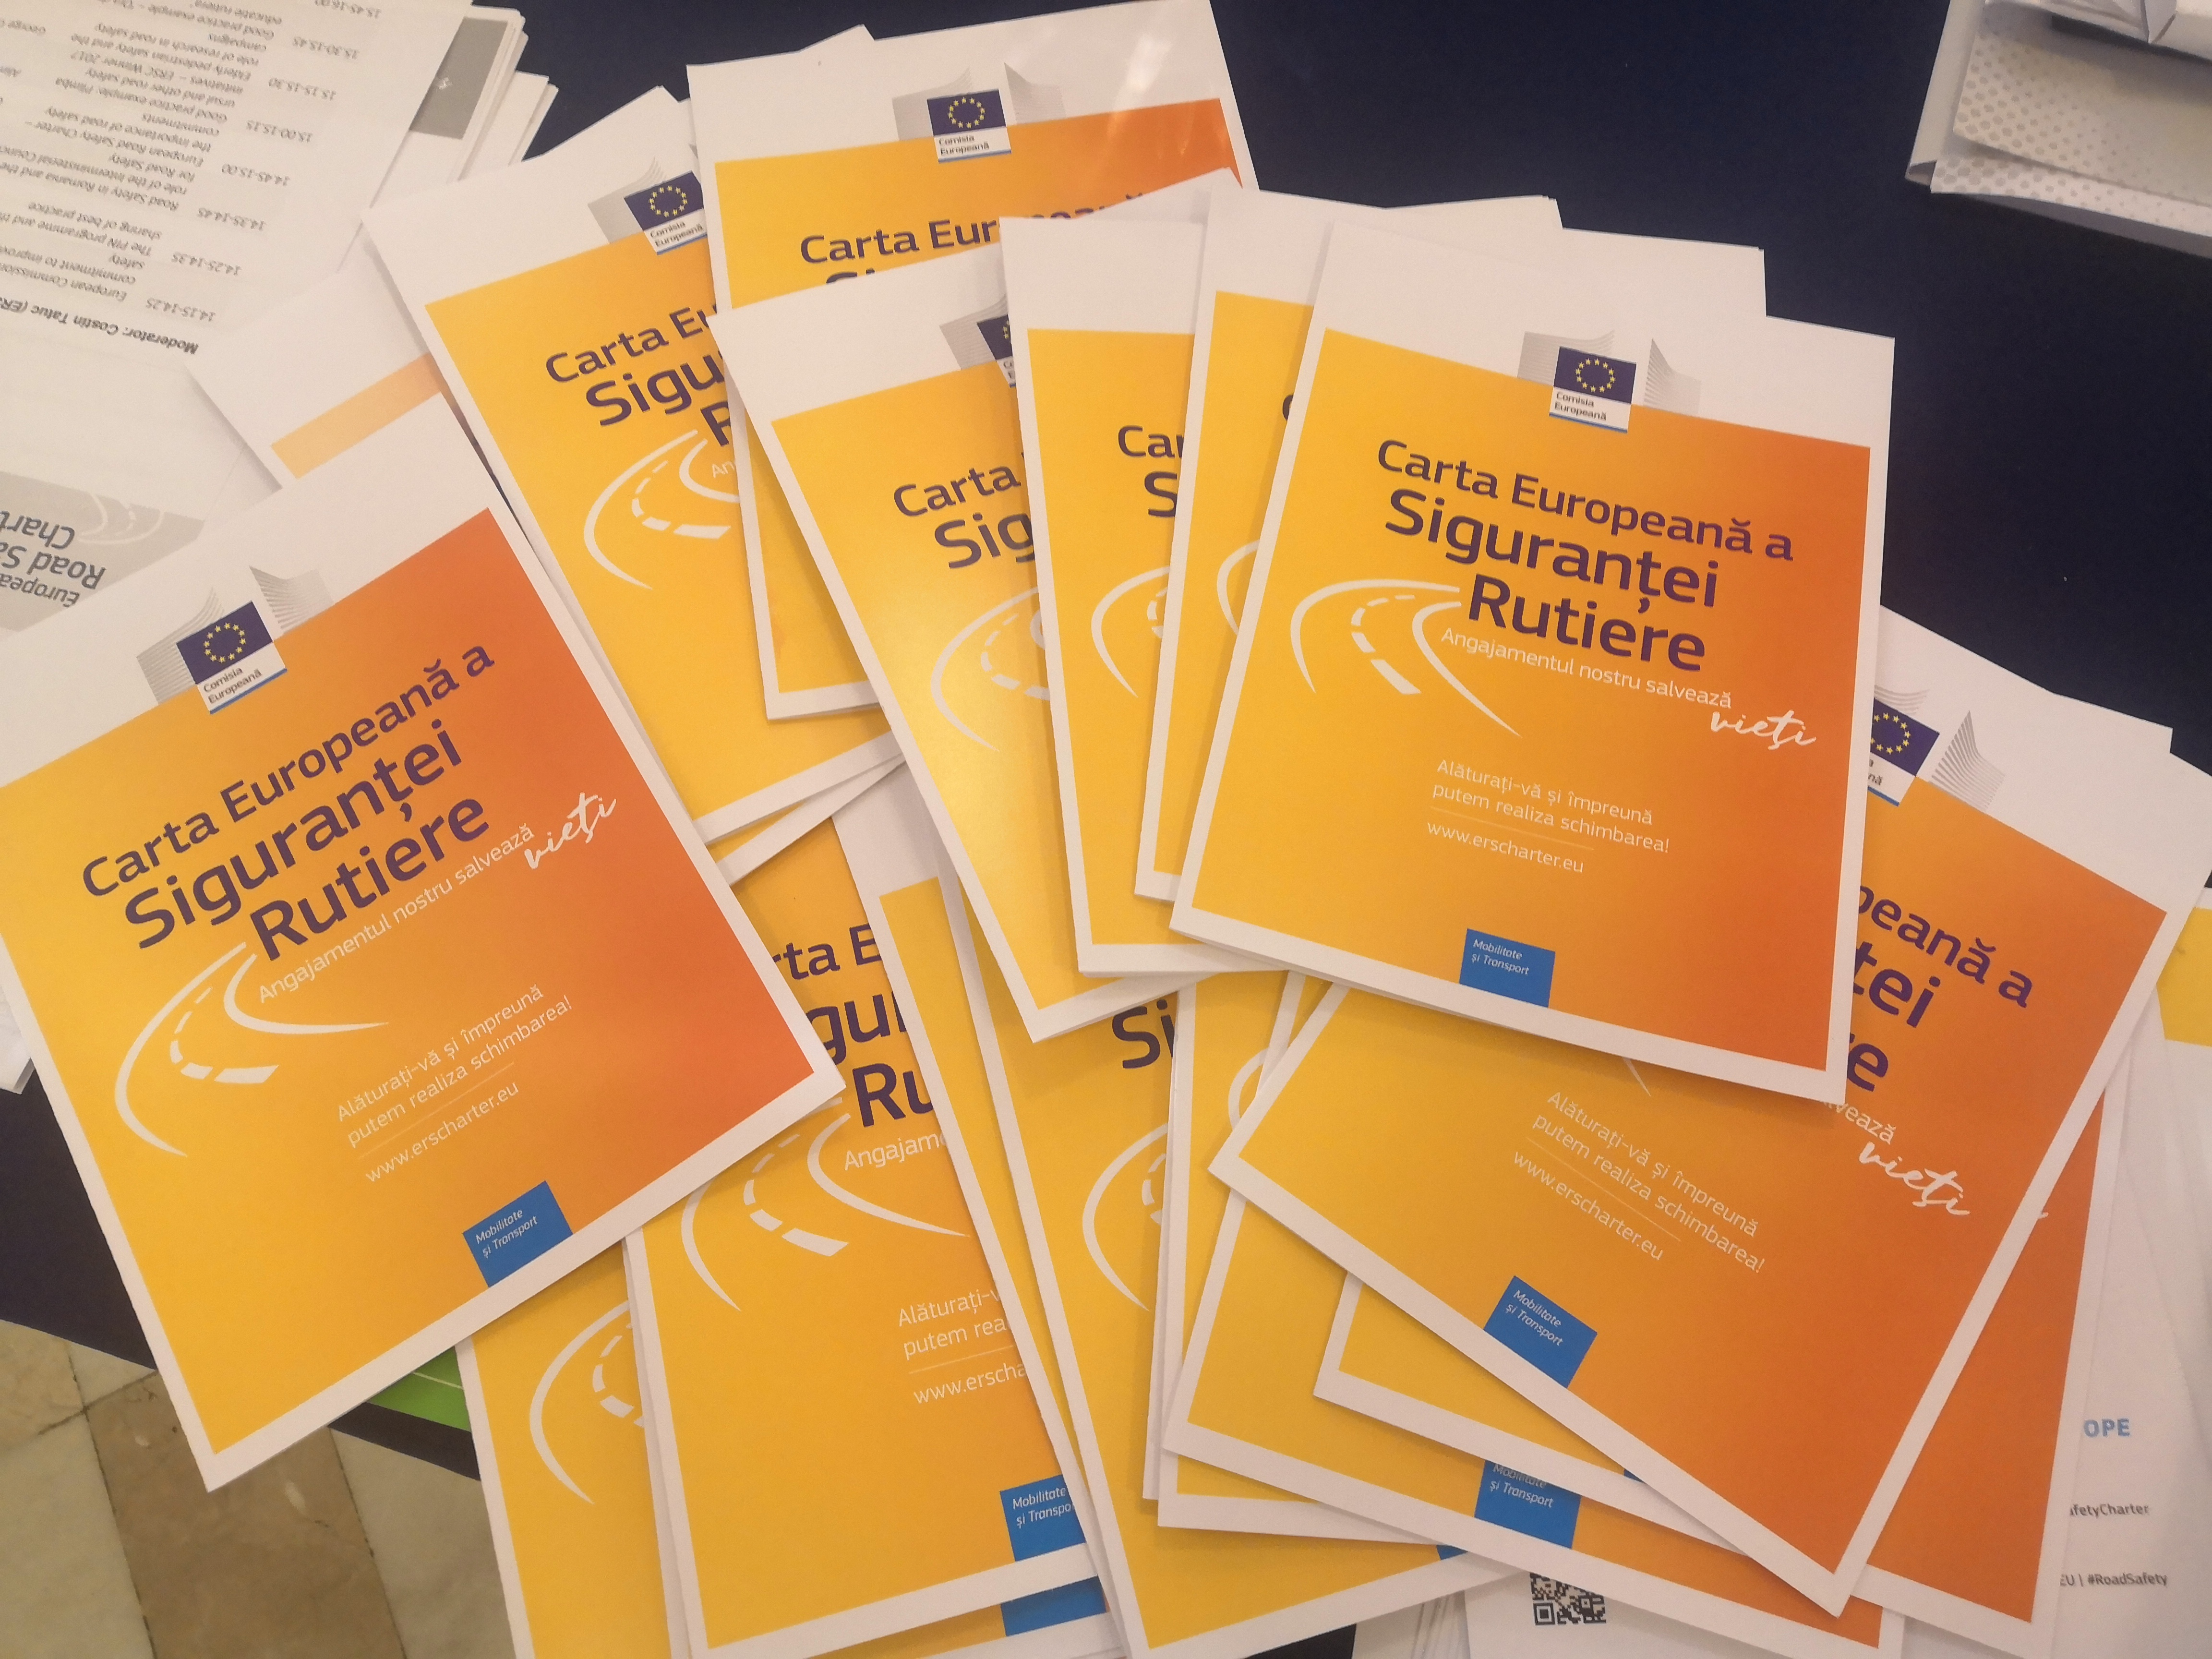 European Road Safety Charter Workshop In Bucharest Romania